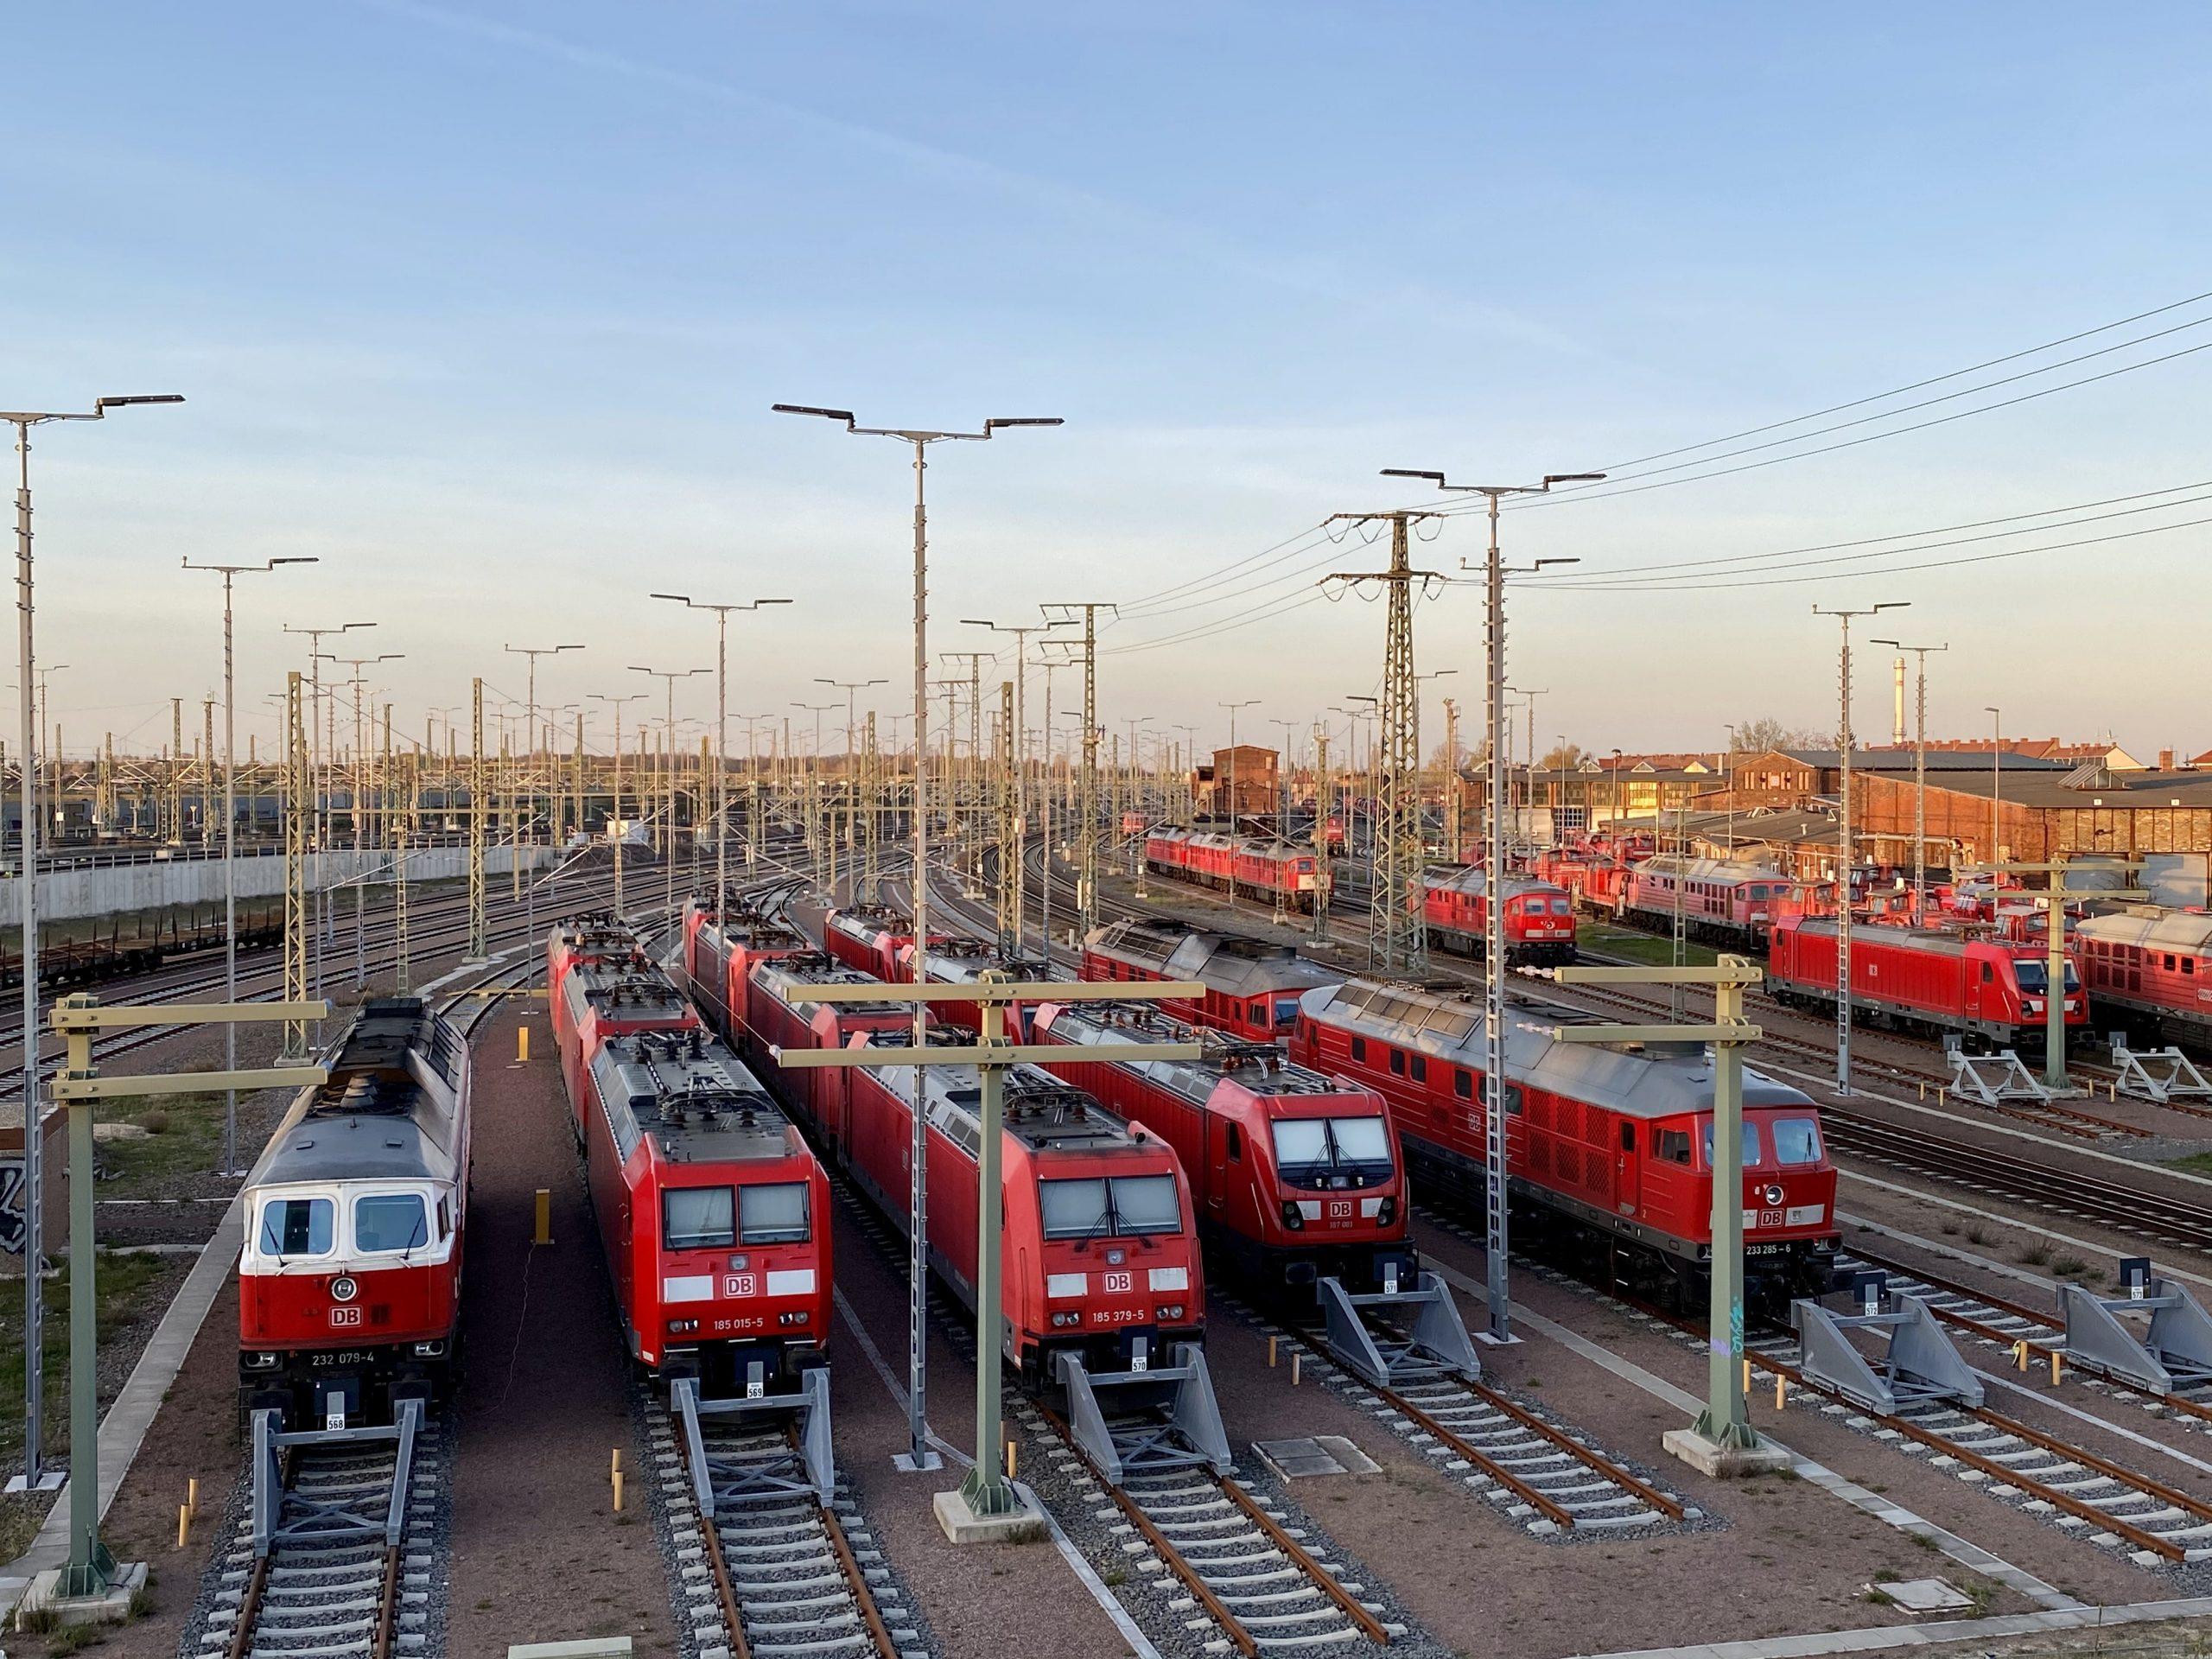 ©Foto: Jan Krehl | railmen | DB Flotte